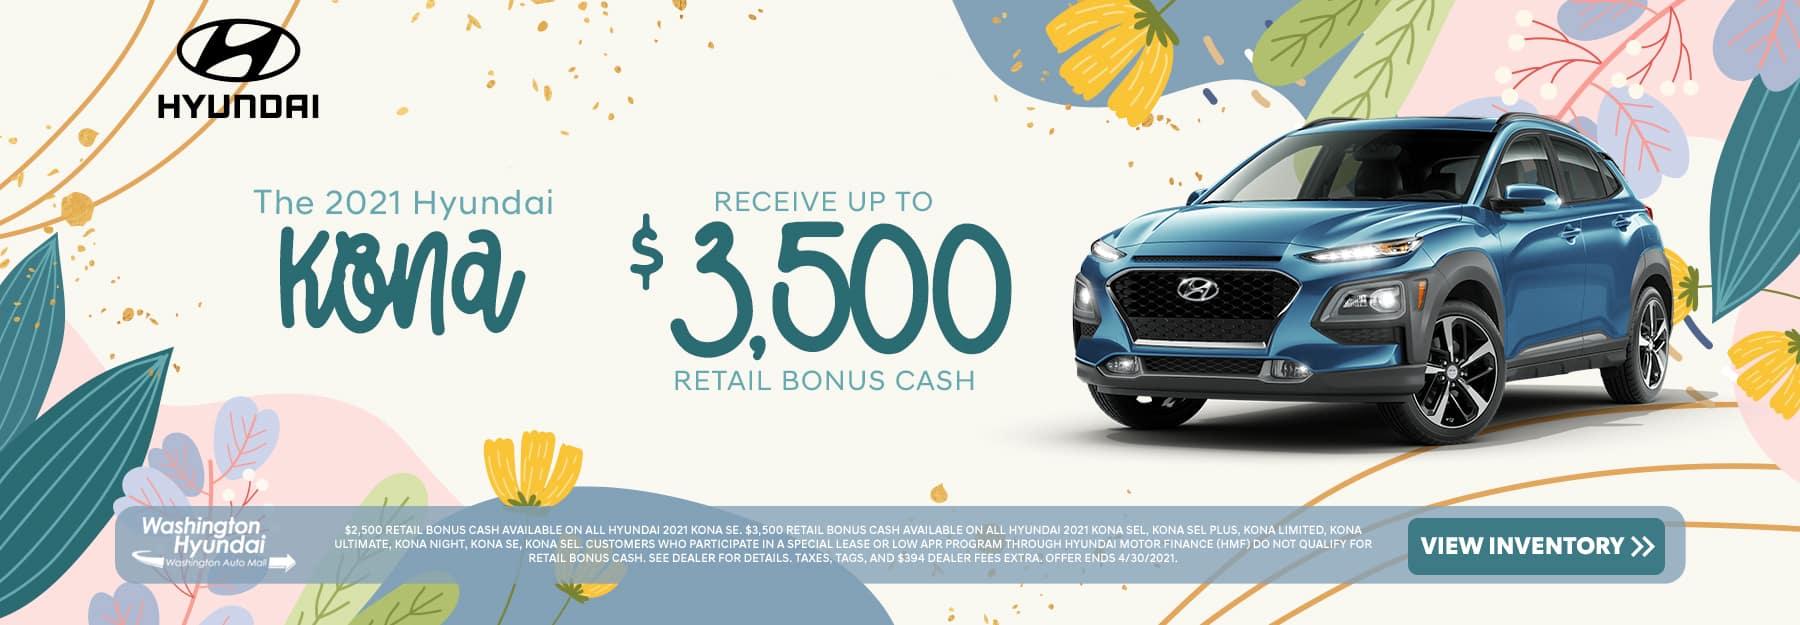 The 2021 Hyundai Kona - receive up to $3,500 retail bonus cash.